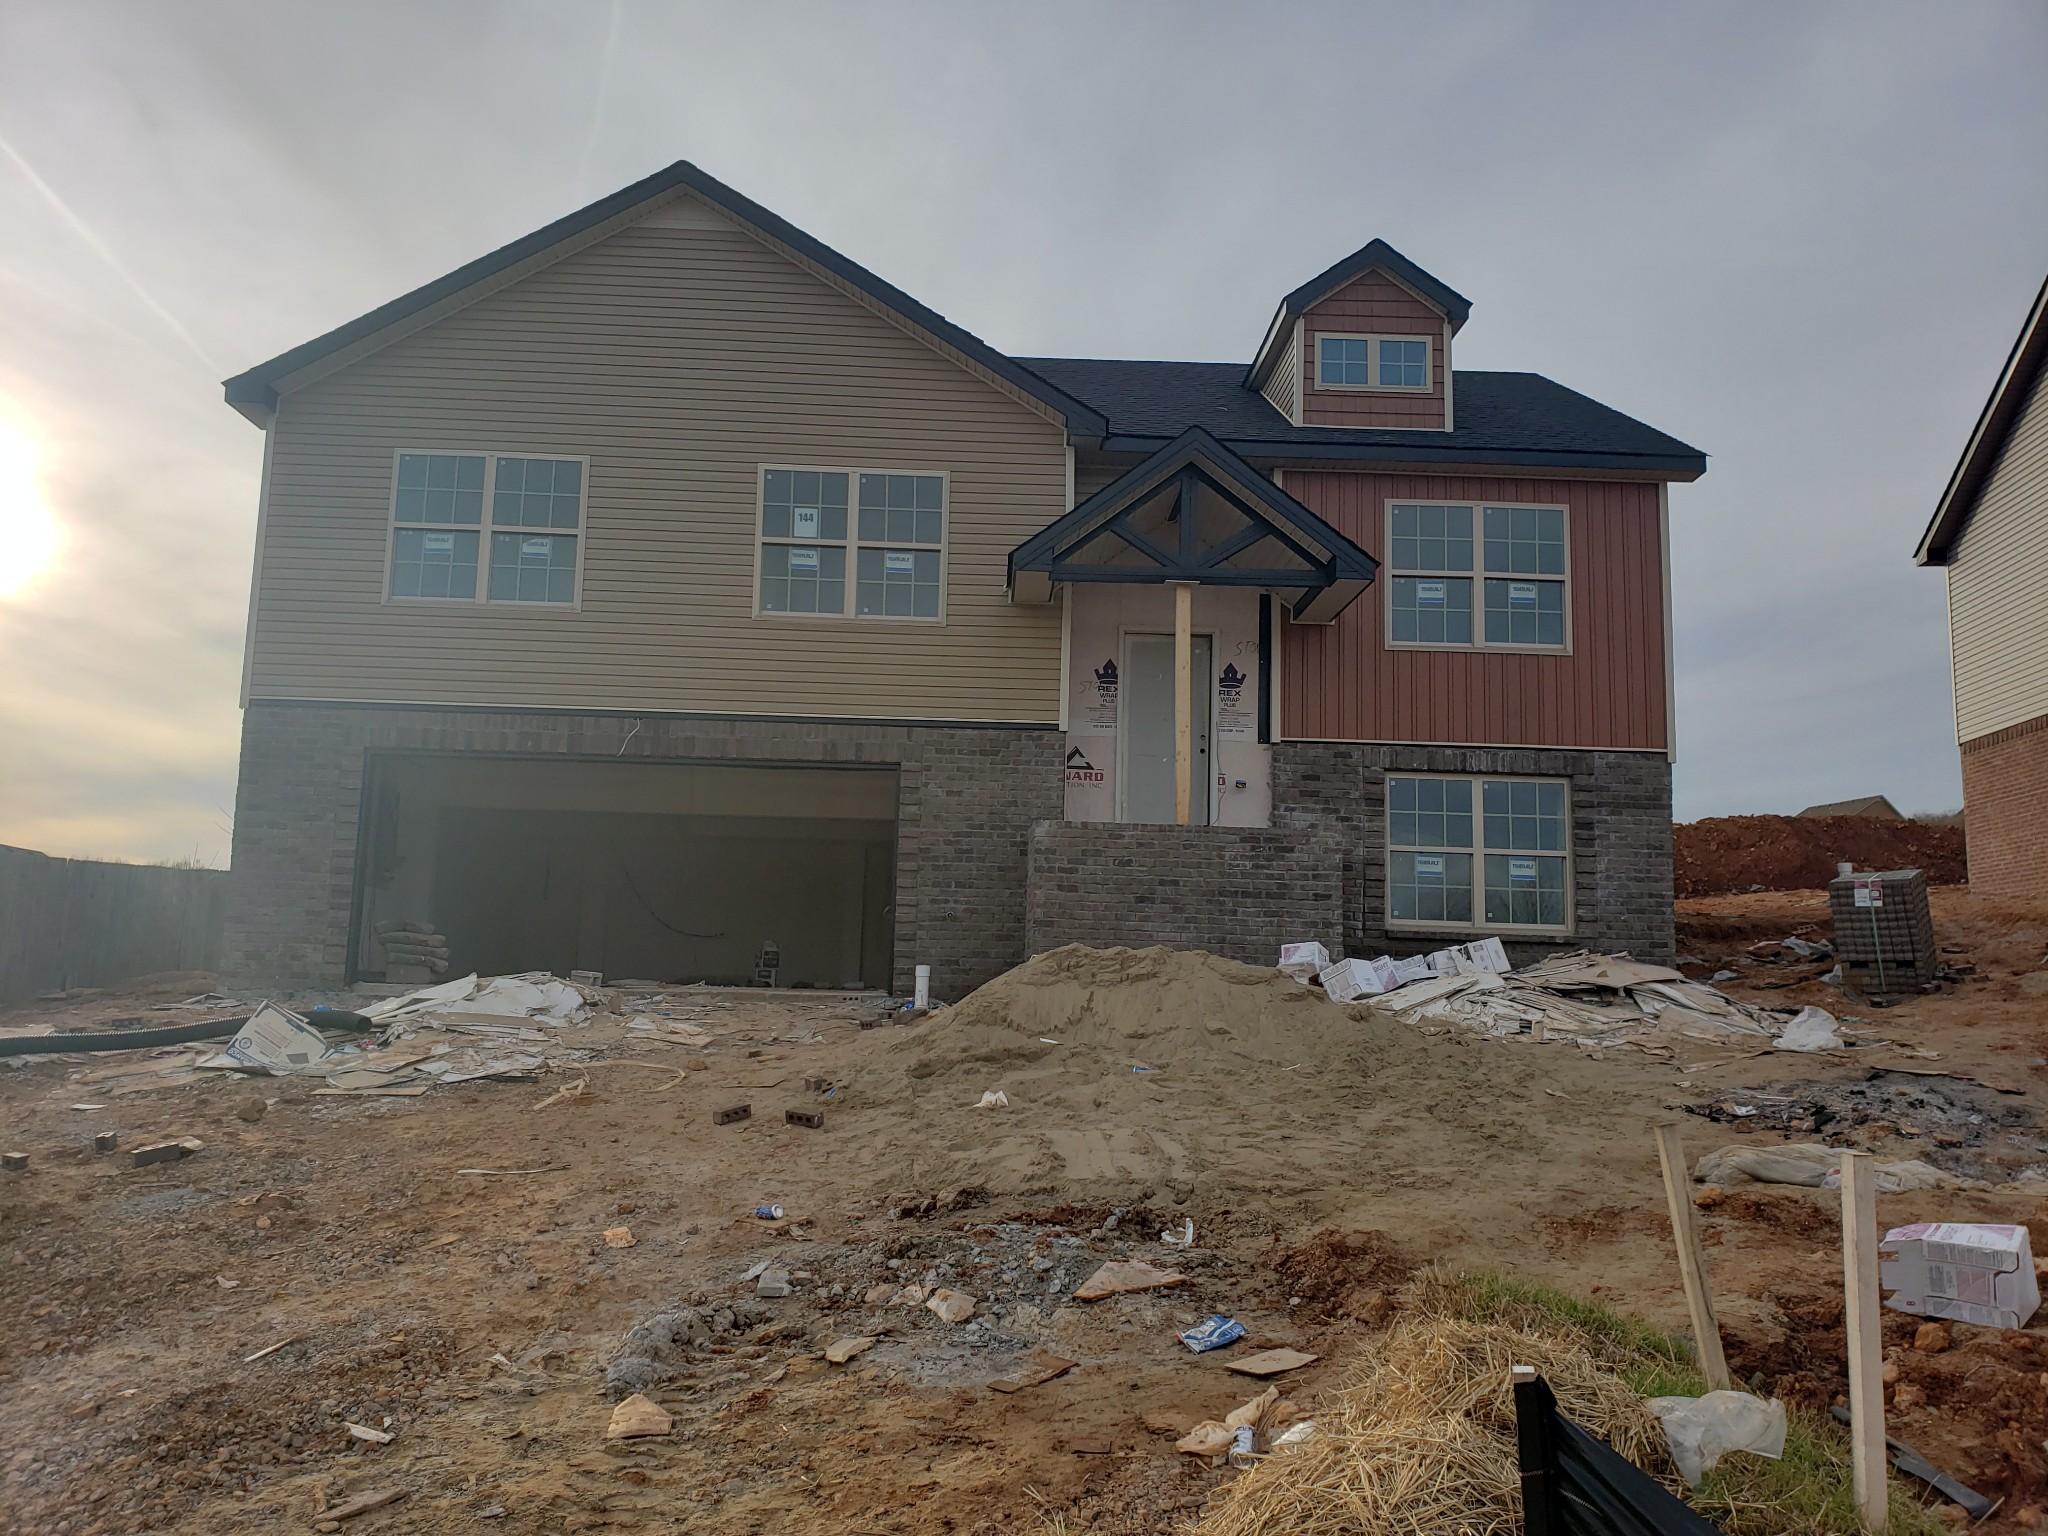 702 Banister Dr (lot 144), Clarksville, TN 37042 - Clarksville, TN real estate listing